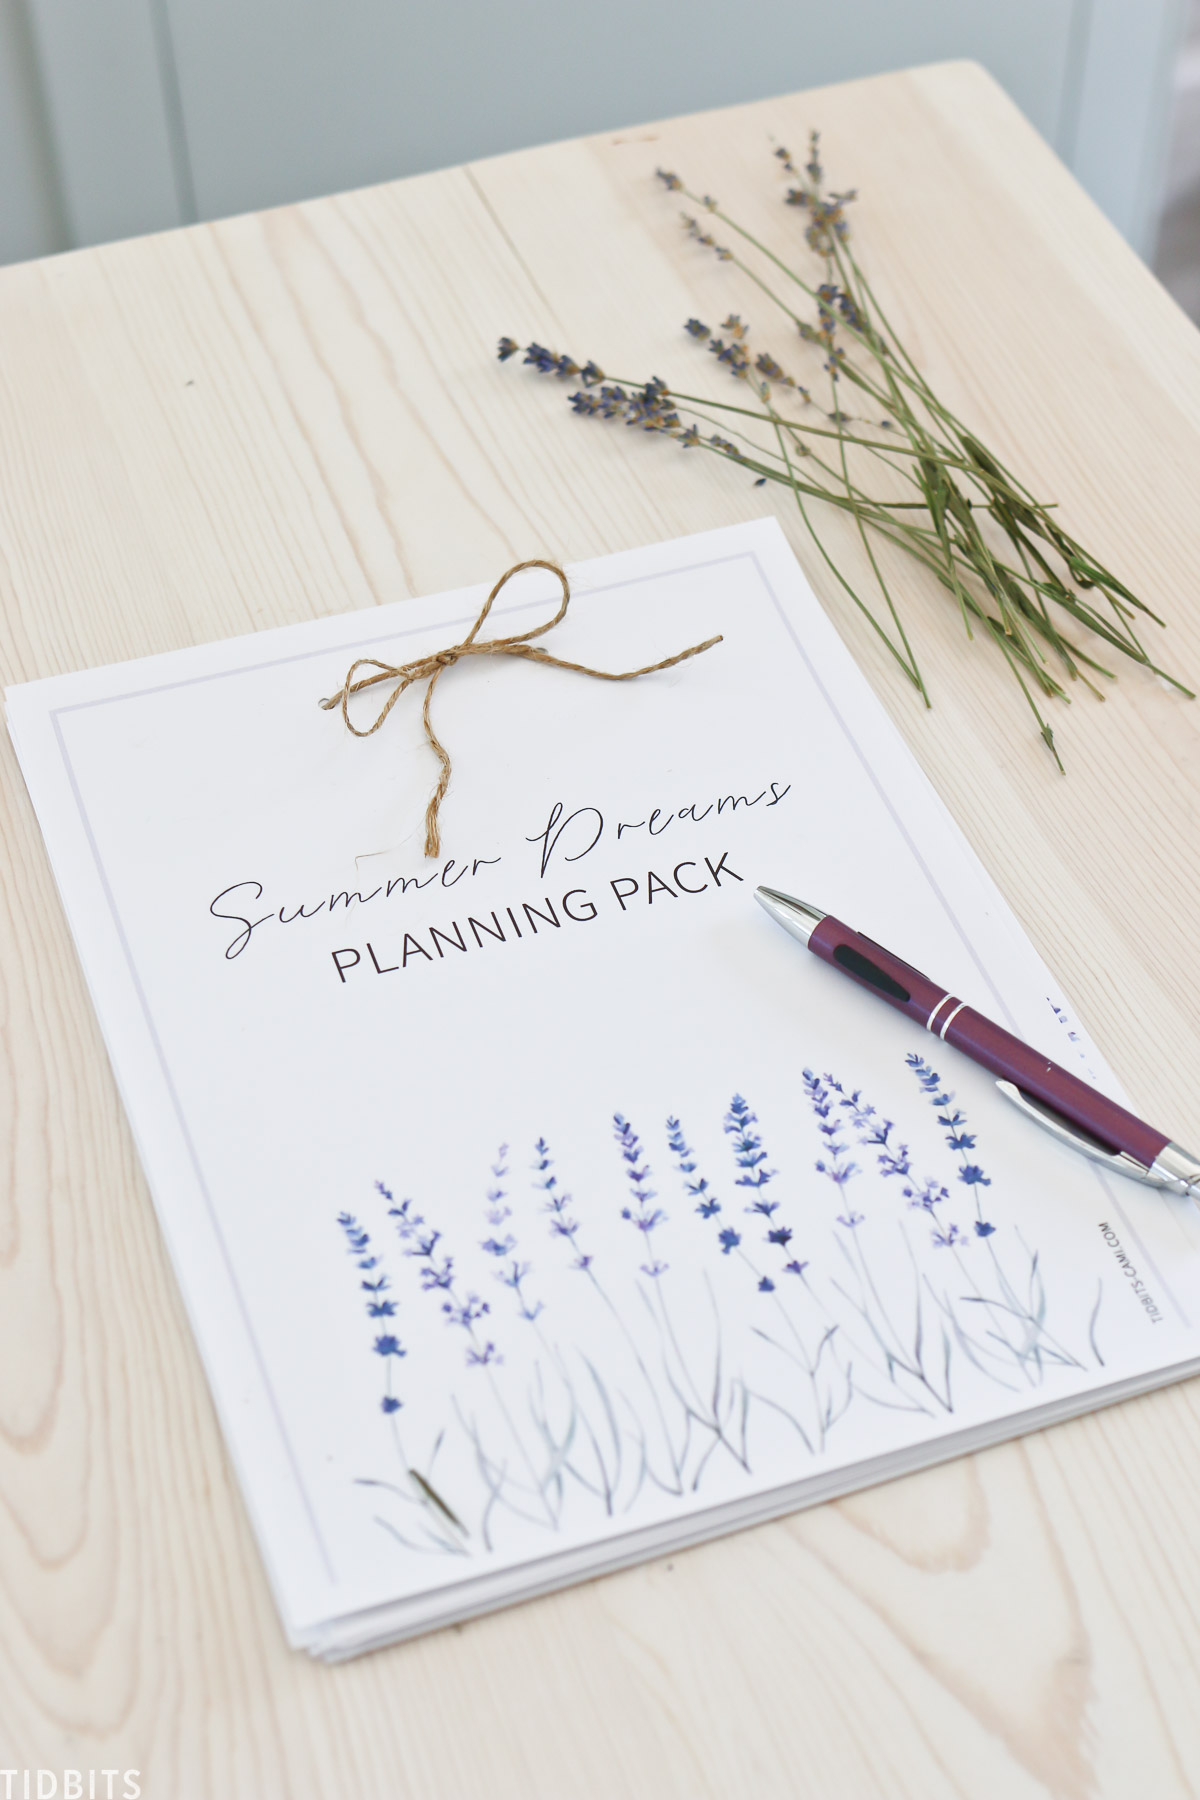 Summer Dreams Planning Pack - Free Printable